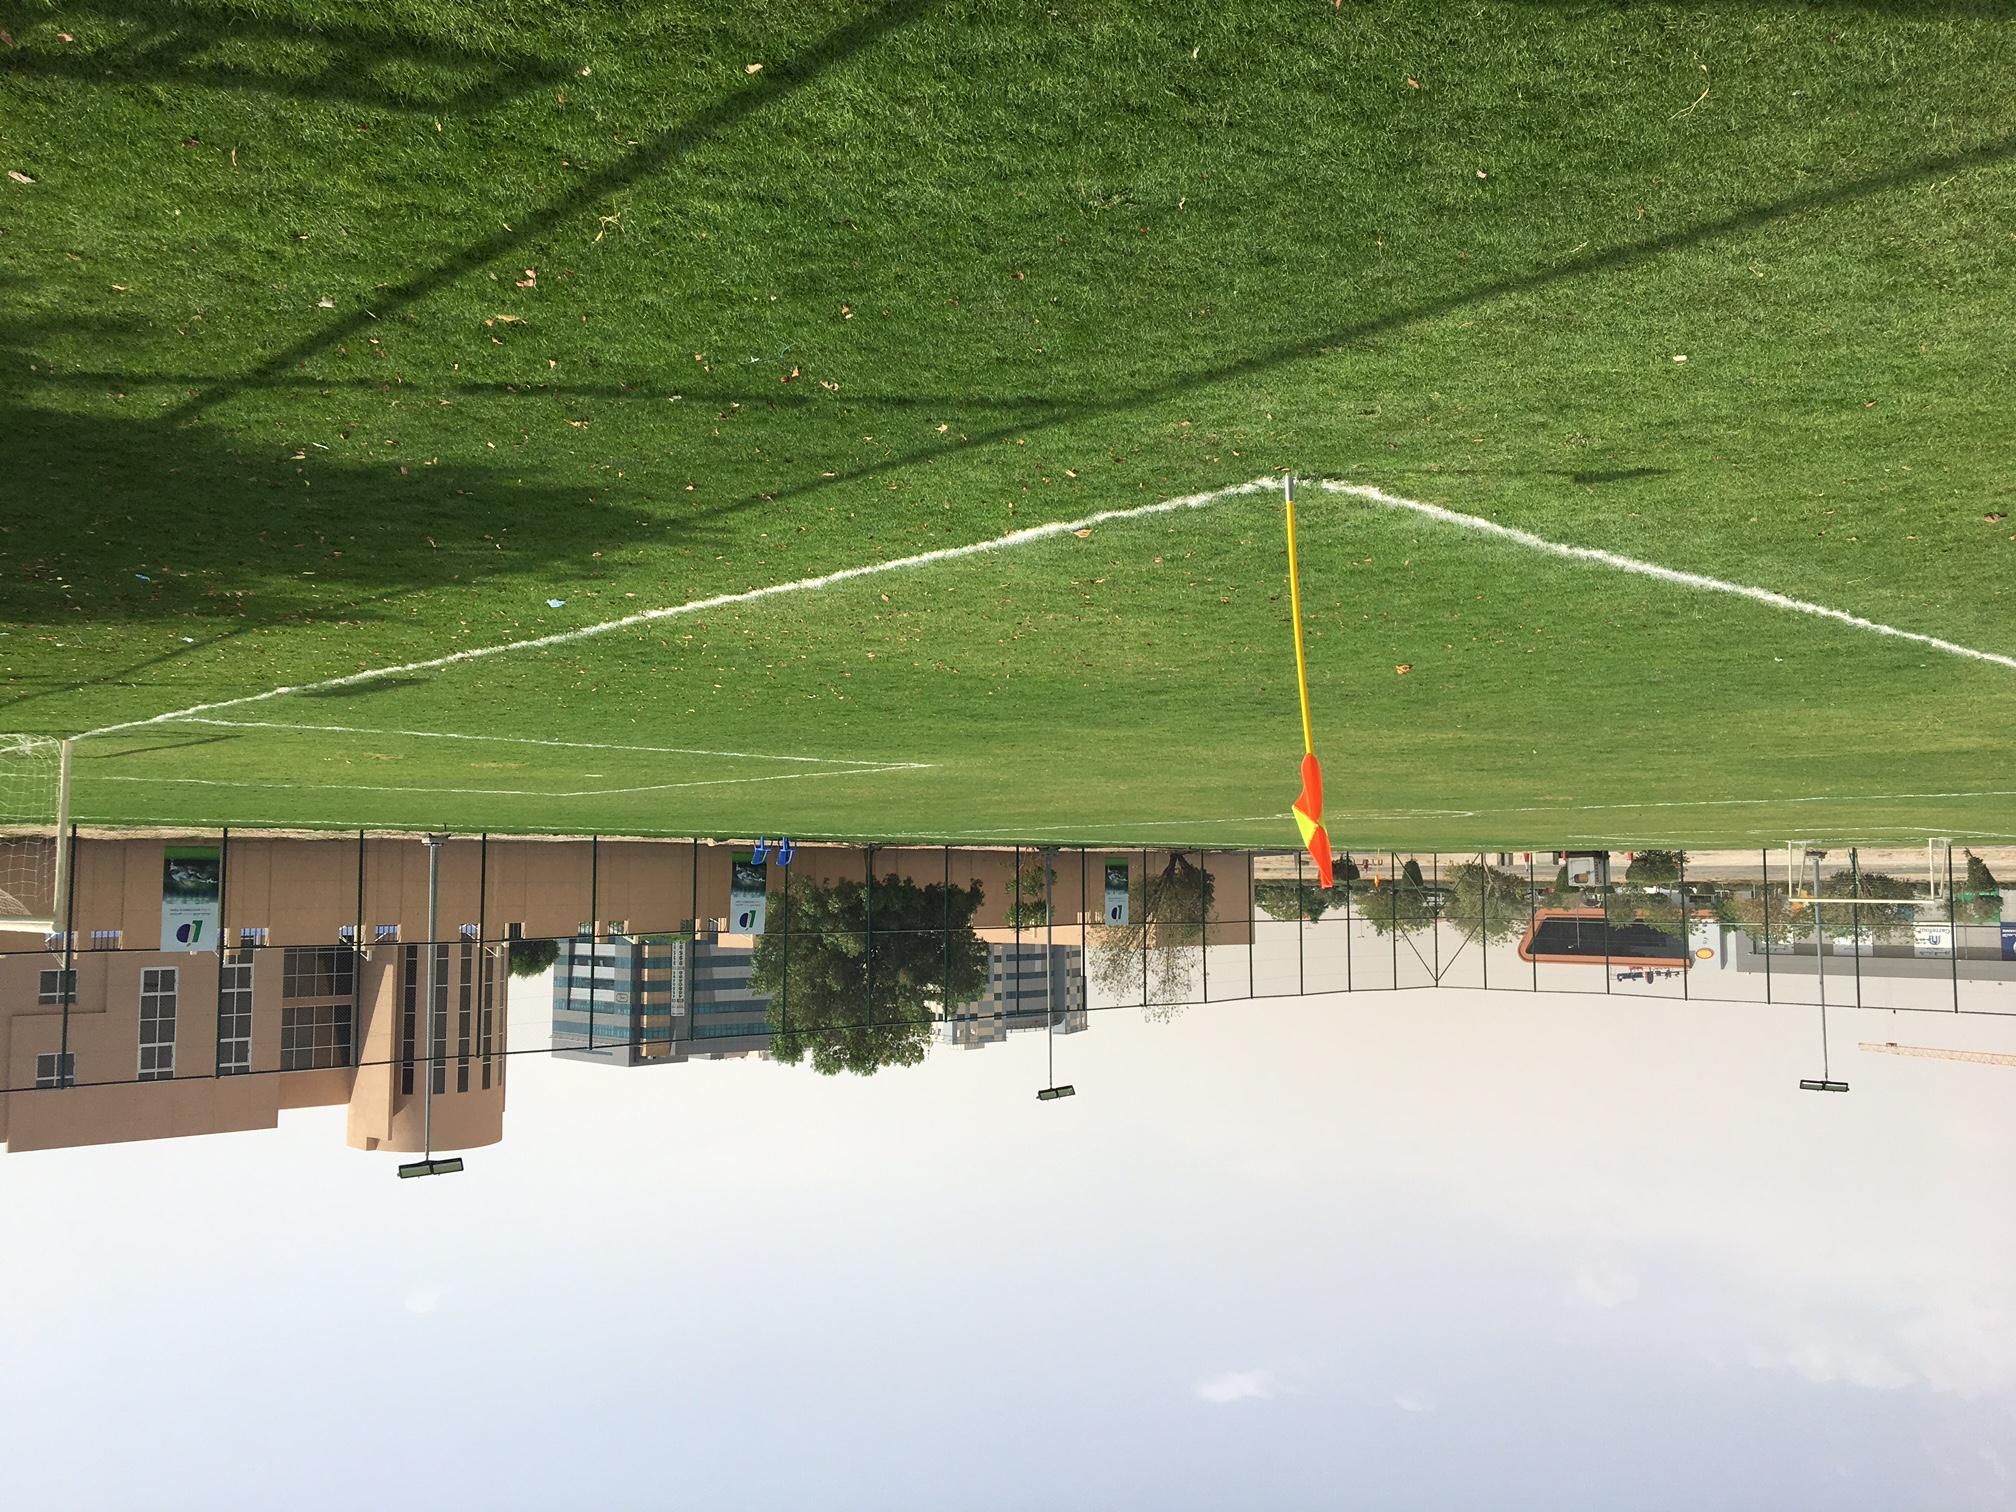 DIP Soccer Field - Daylight C1